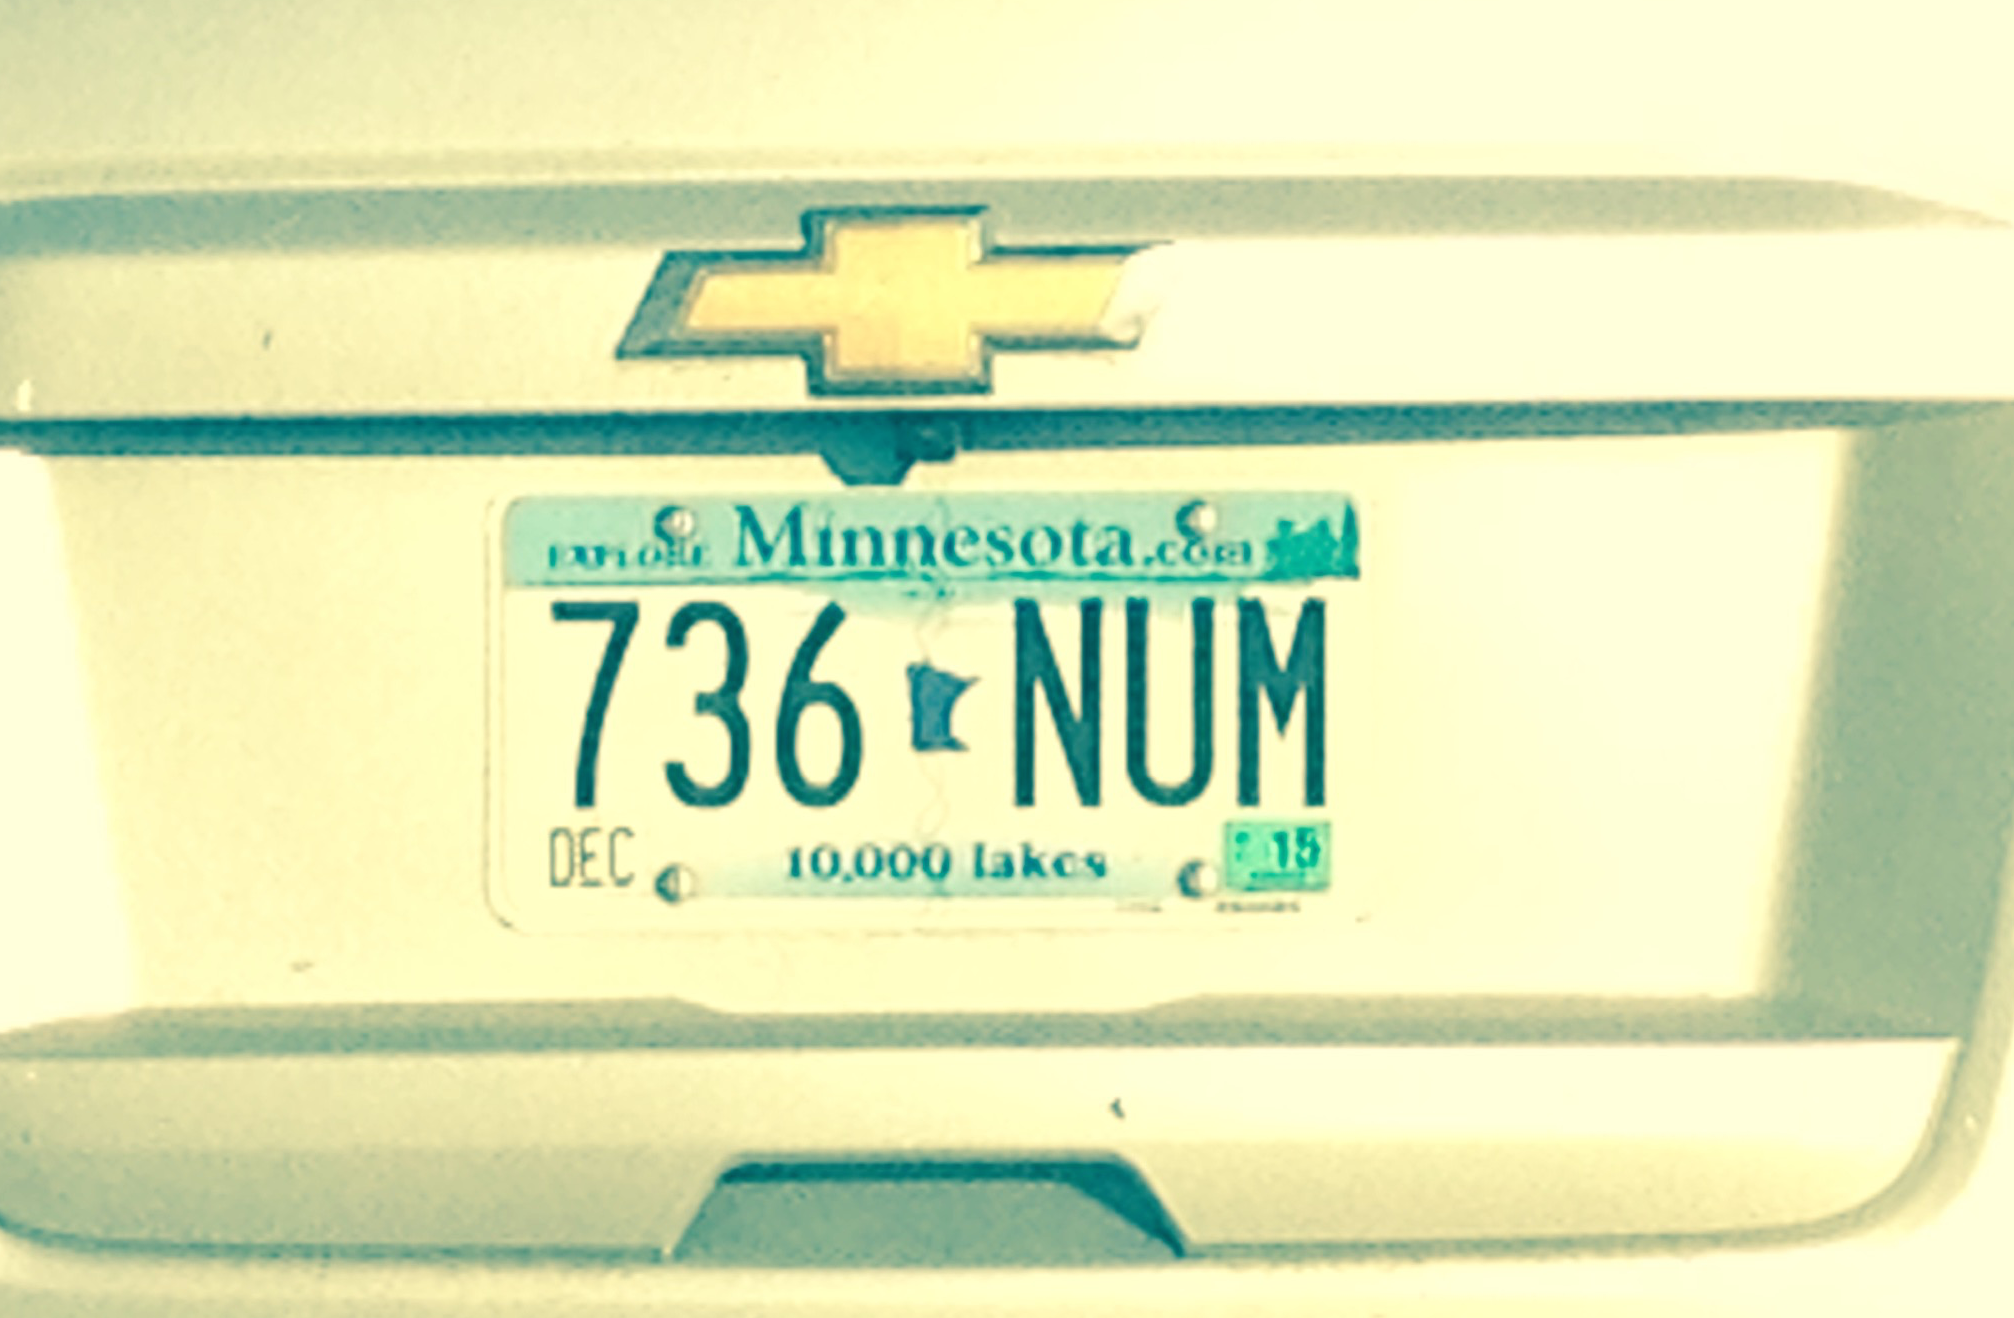 Minnesota hatchback